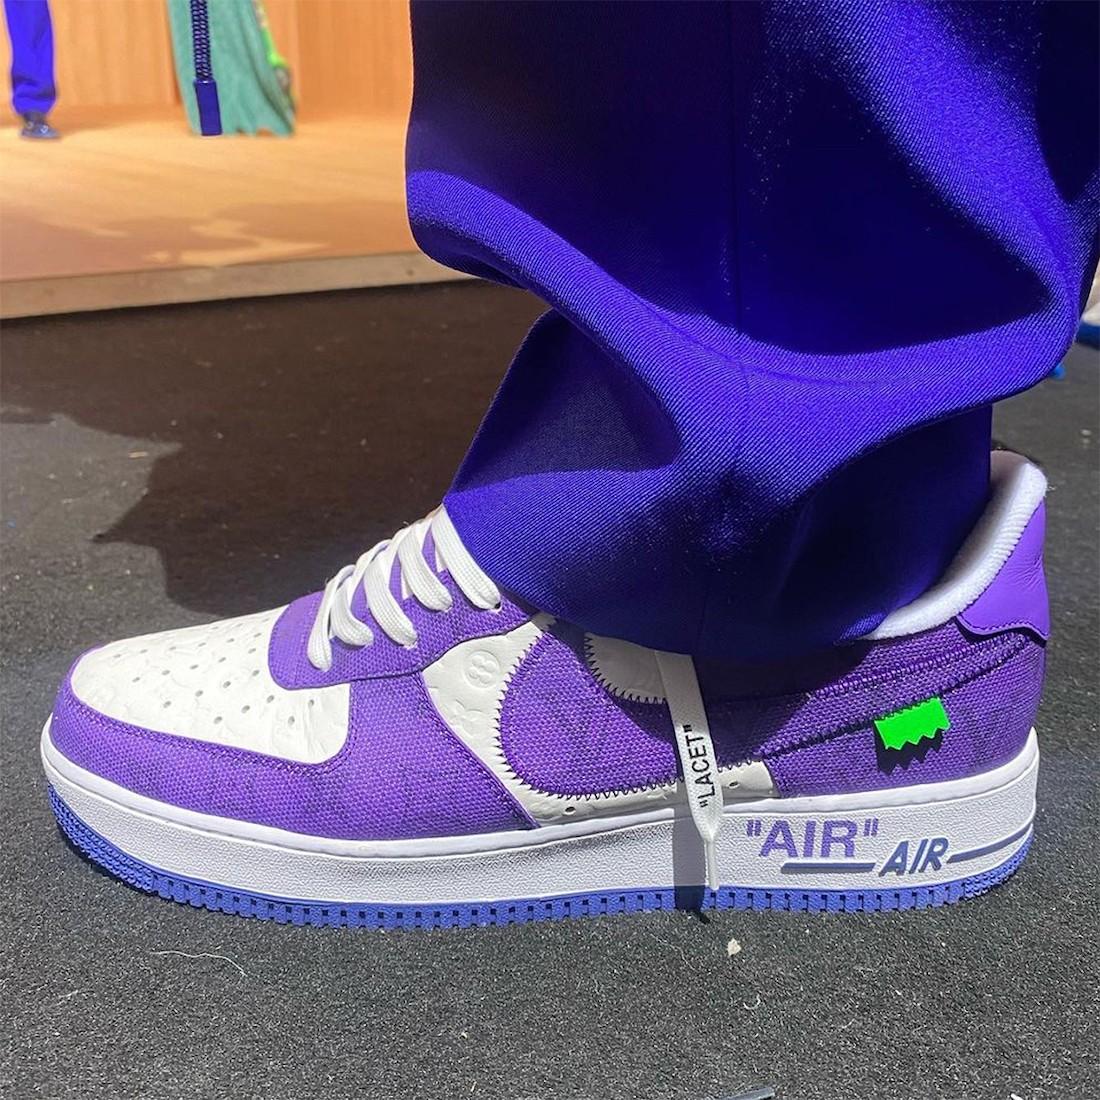 LV,Virgil,Nike,Air Force 1 Low  LV x OW x Nike 联名曝光?实物看完一言难尽!网友:就这?